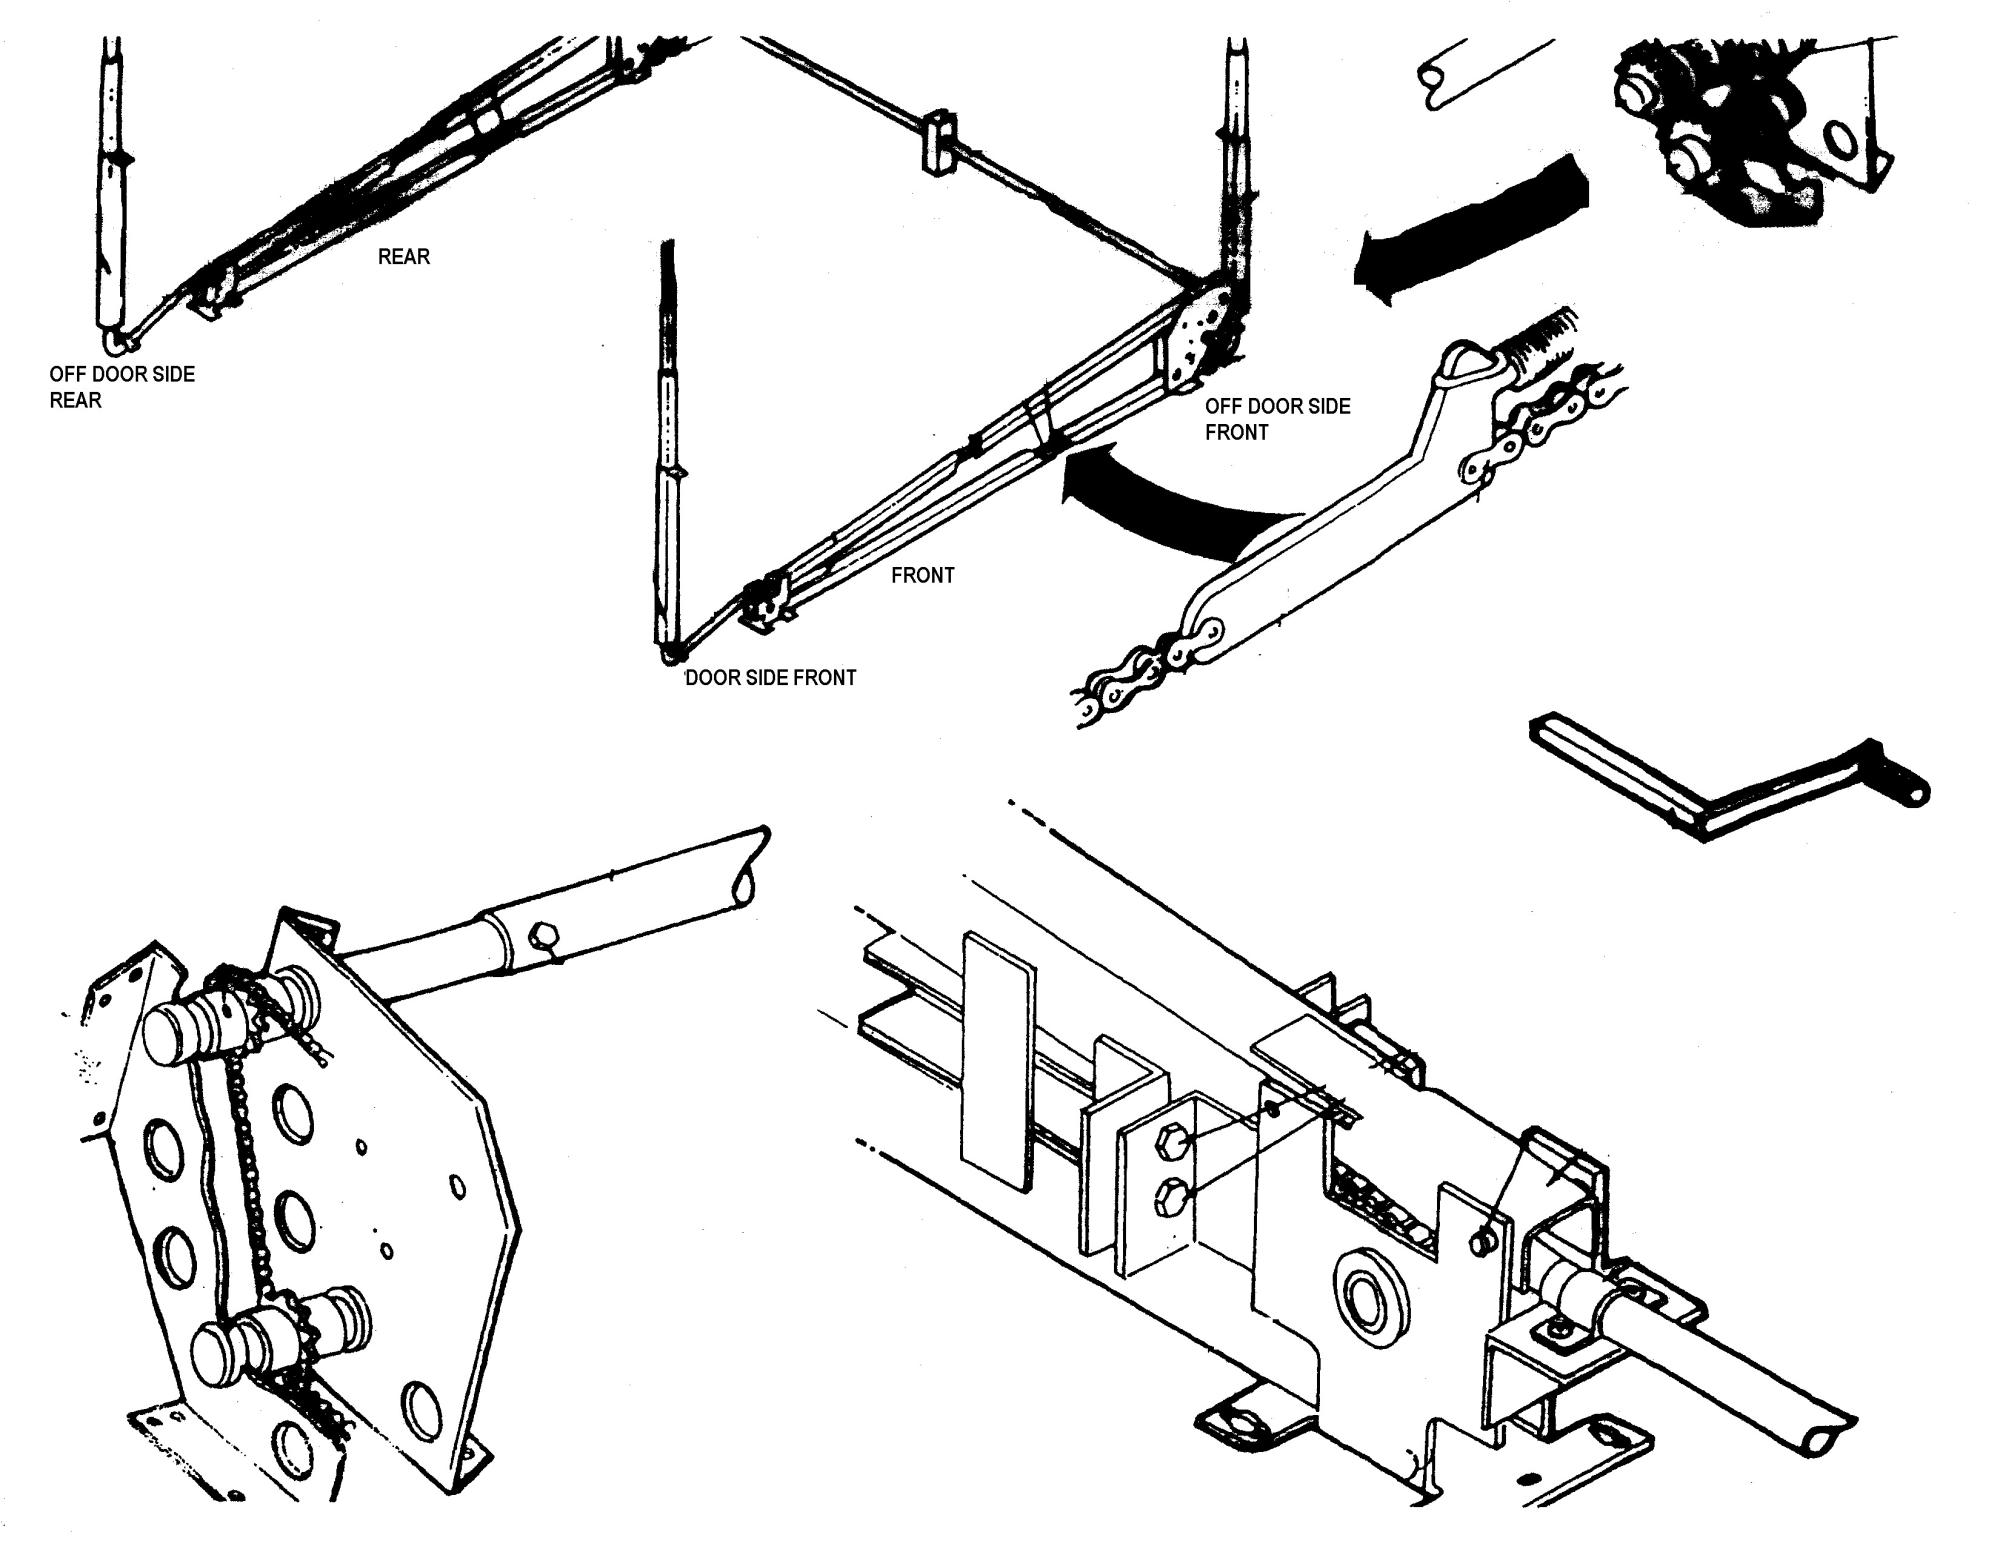 hight resolution of 1997 coleman seapine pop up camper wiring diagram